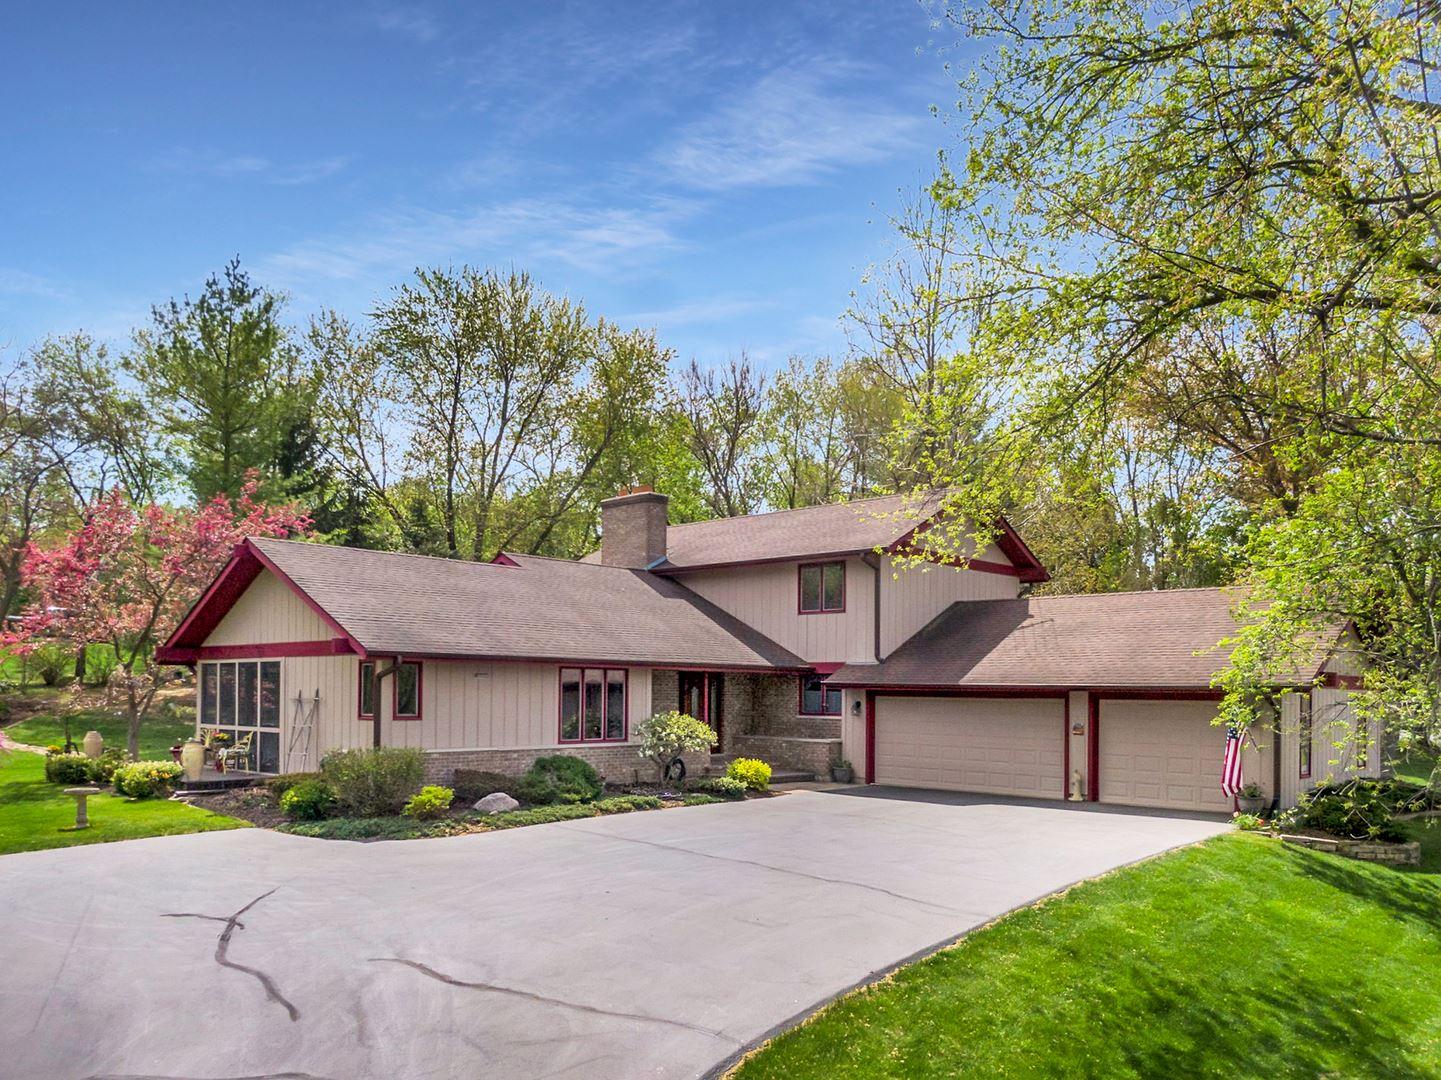 4010 Fox Trail, Crystal Lake, IL 60012 - #: 11072464